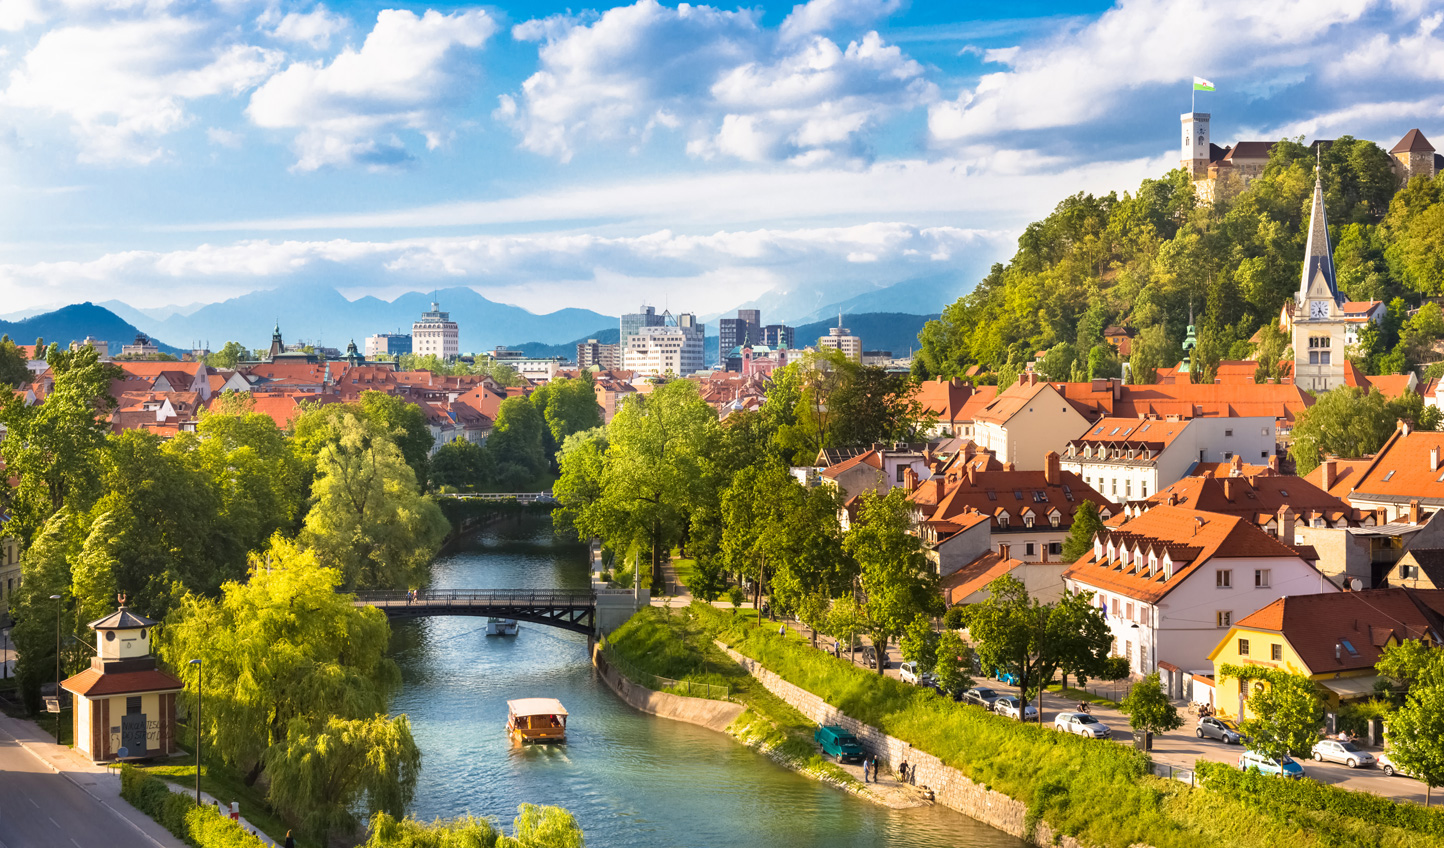 Soak up the charm of Ljubljana